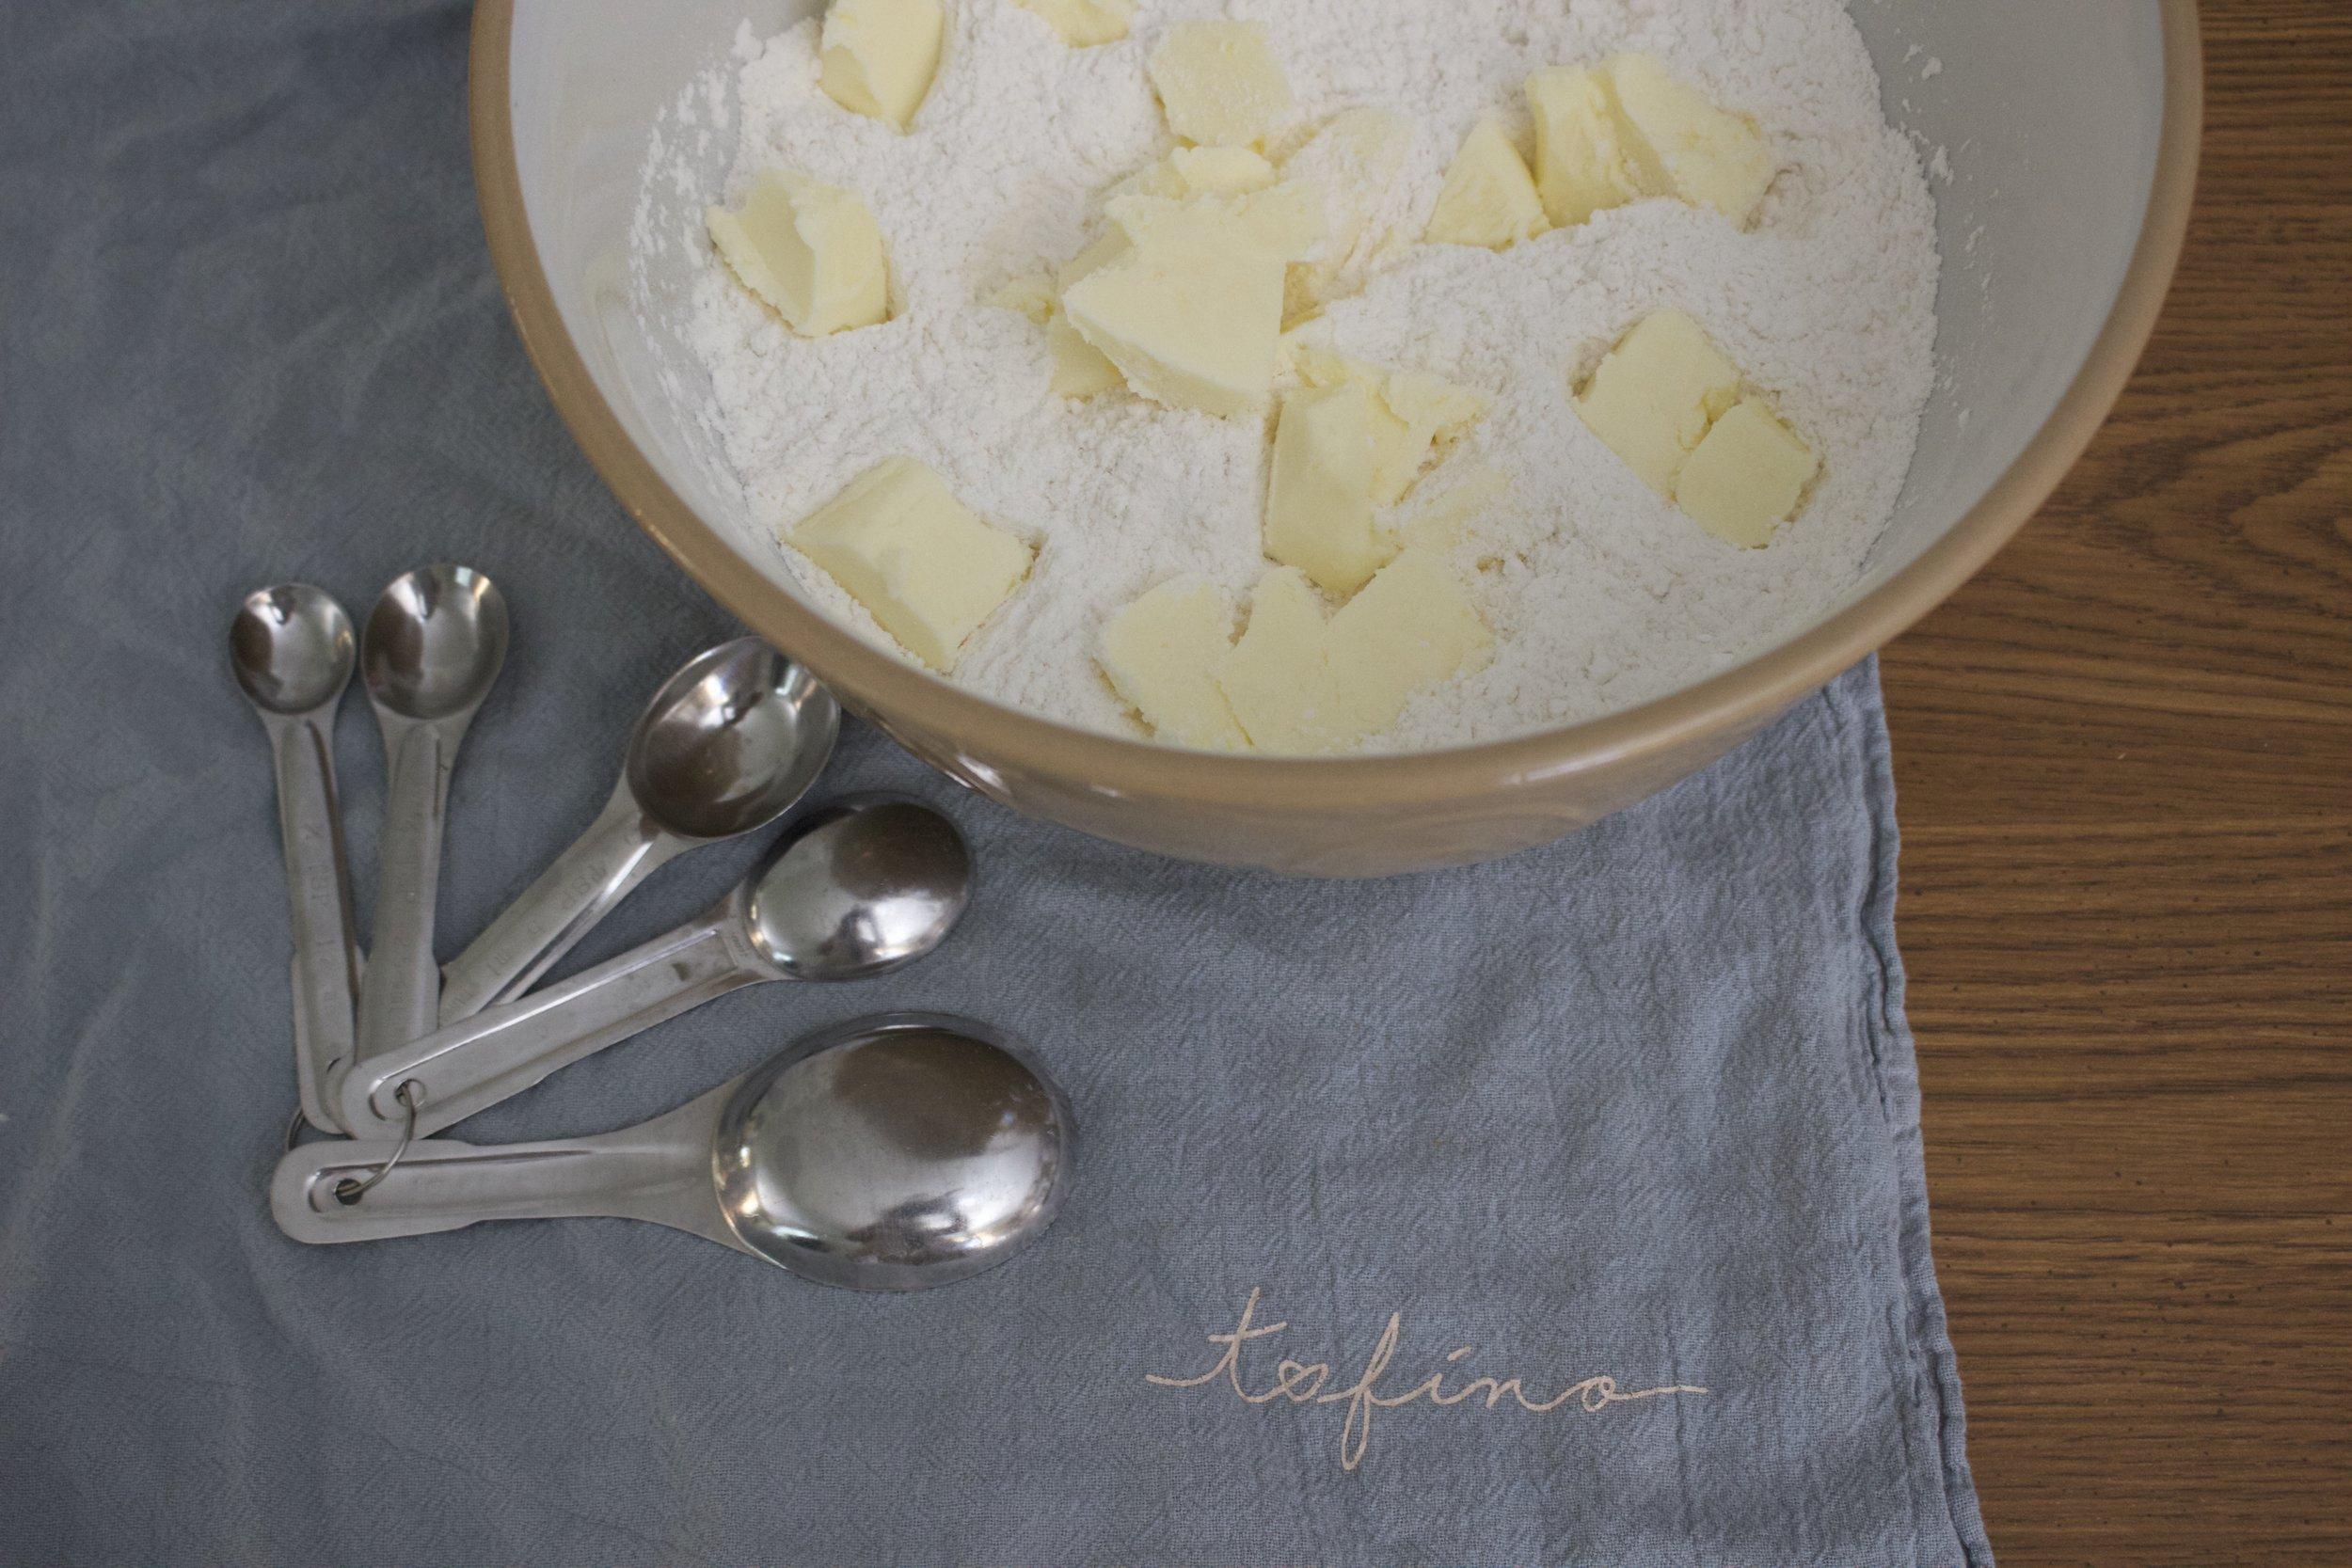 Cutting my butter in